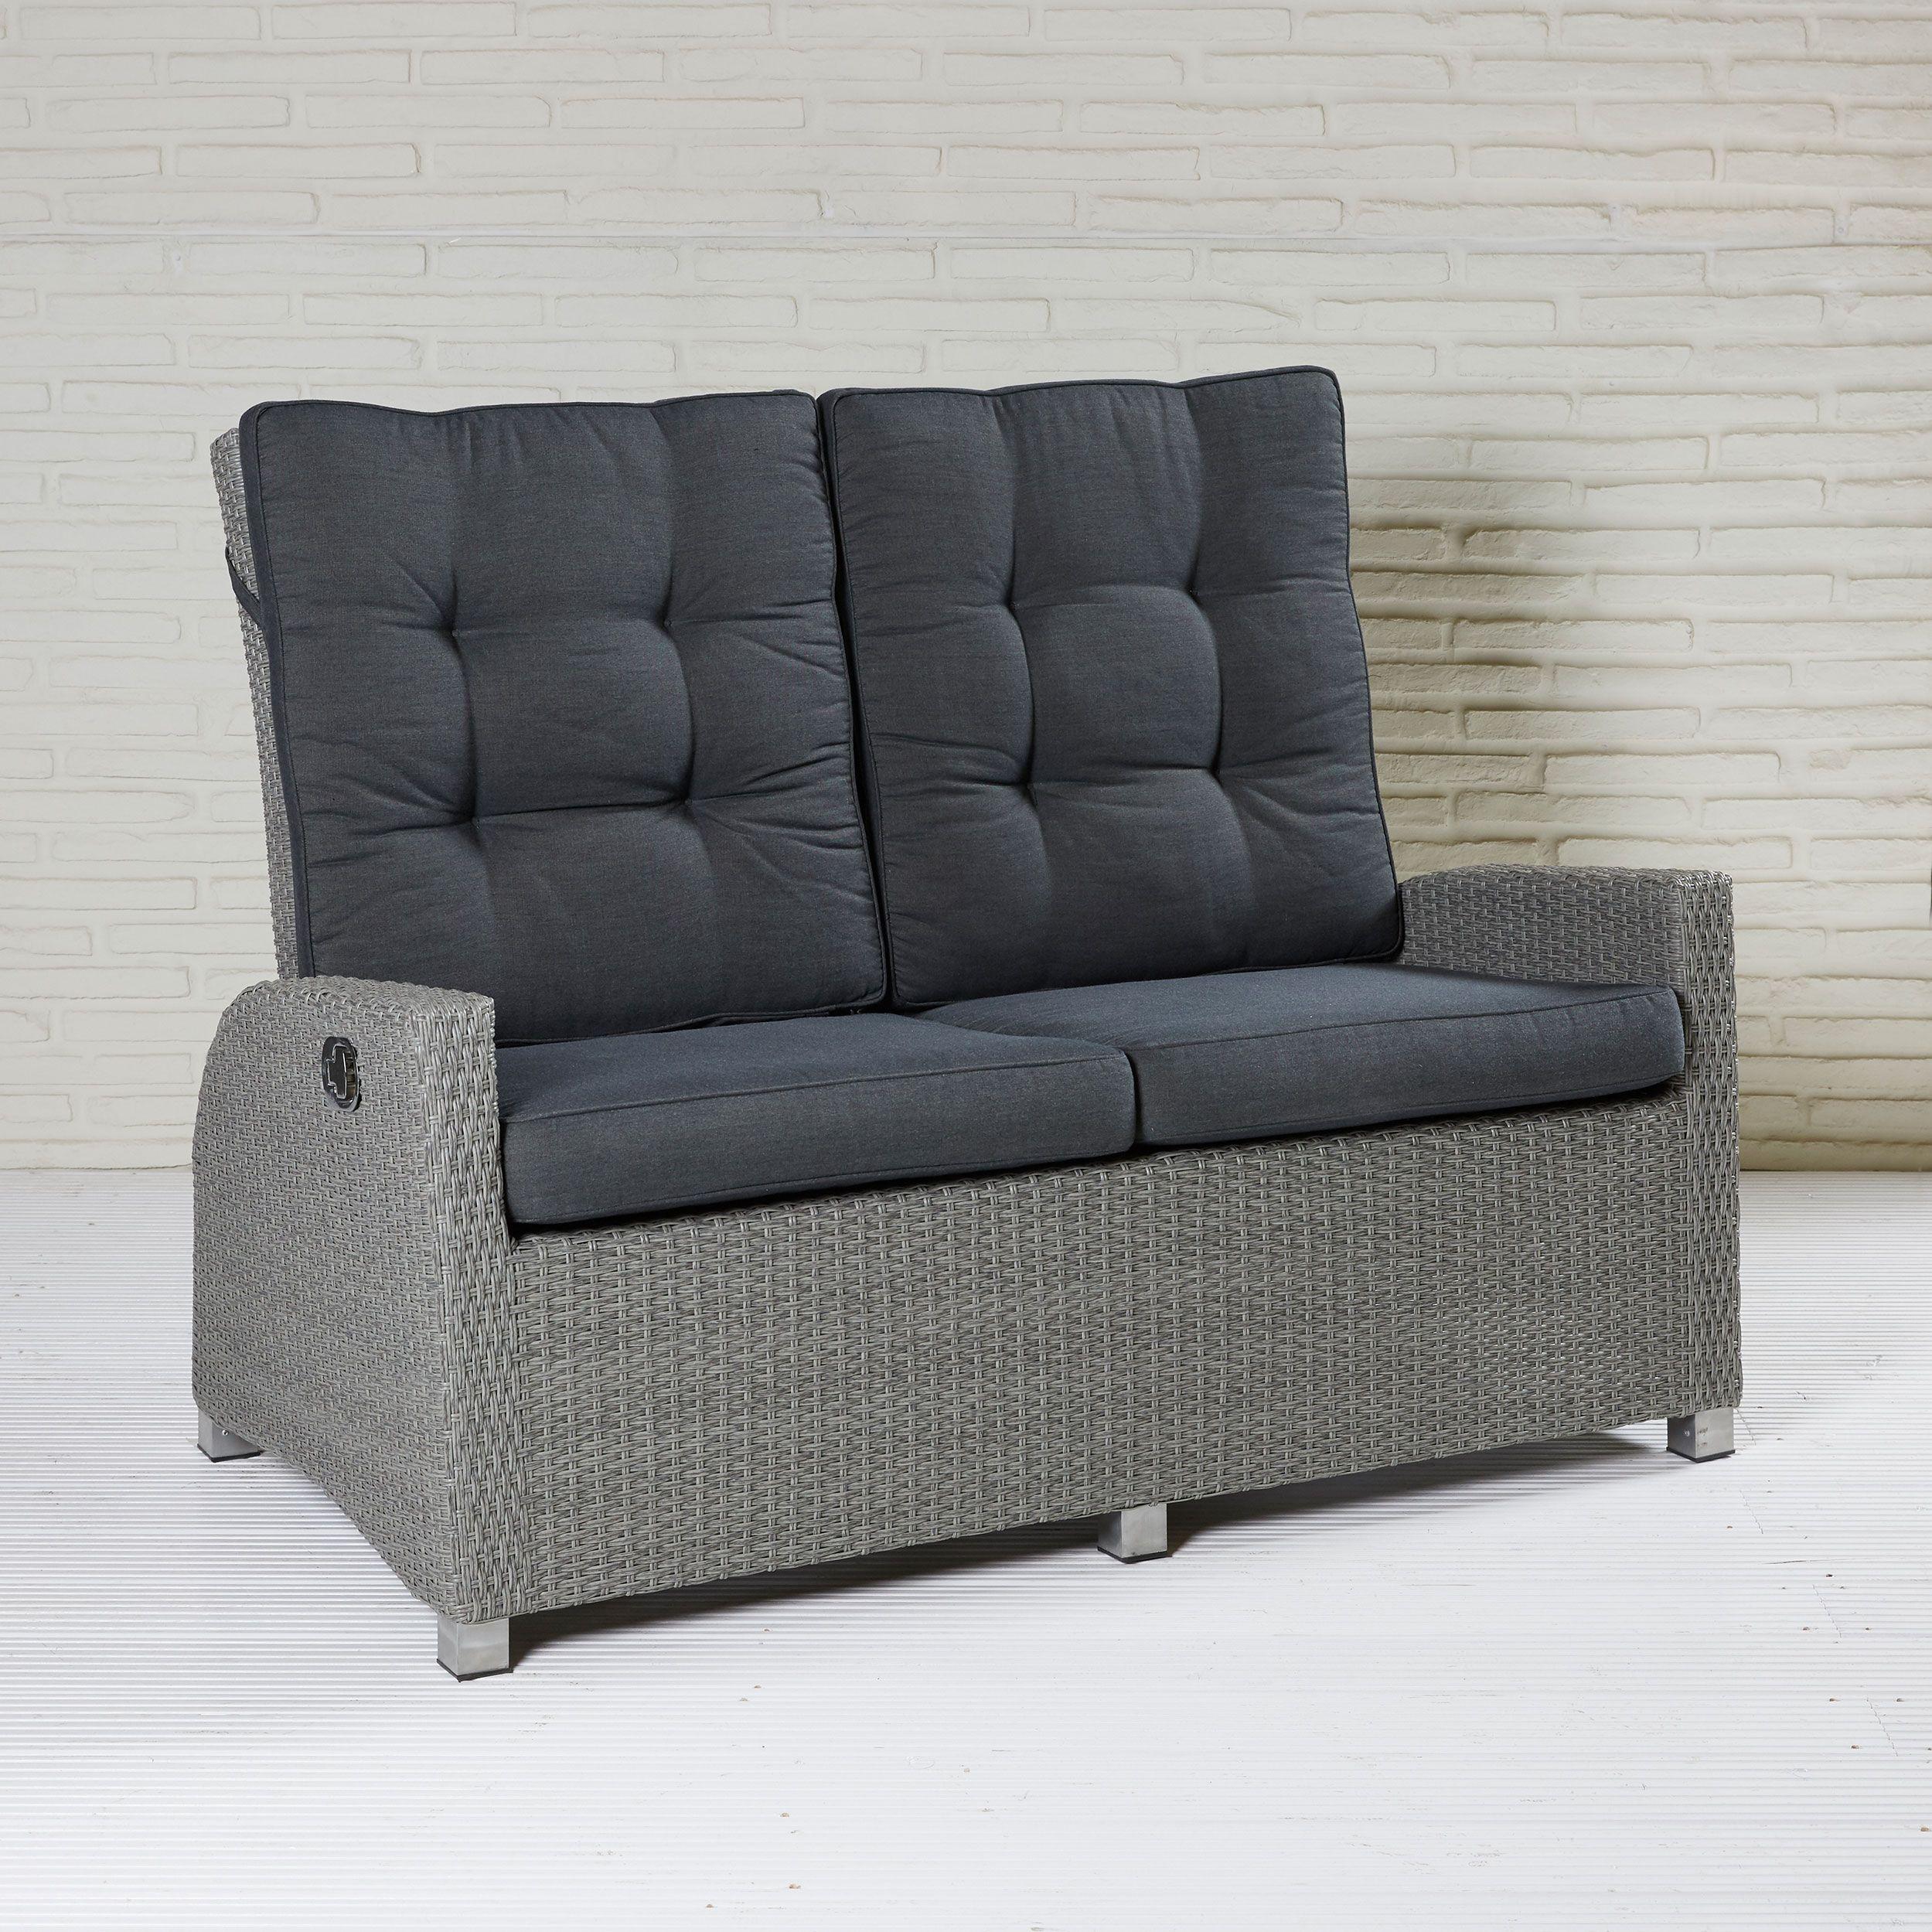 Verschiedene Gartensofa Beste Wahl Modesto Living 2er Sofa #gartenmöbel #gartensofa #couch